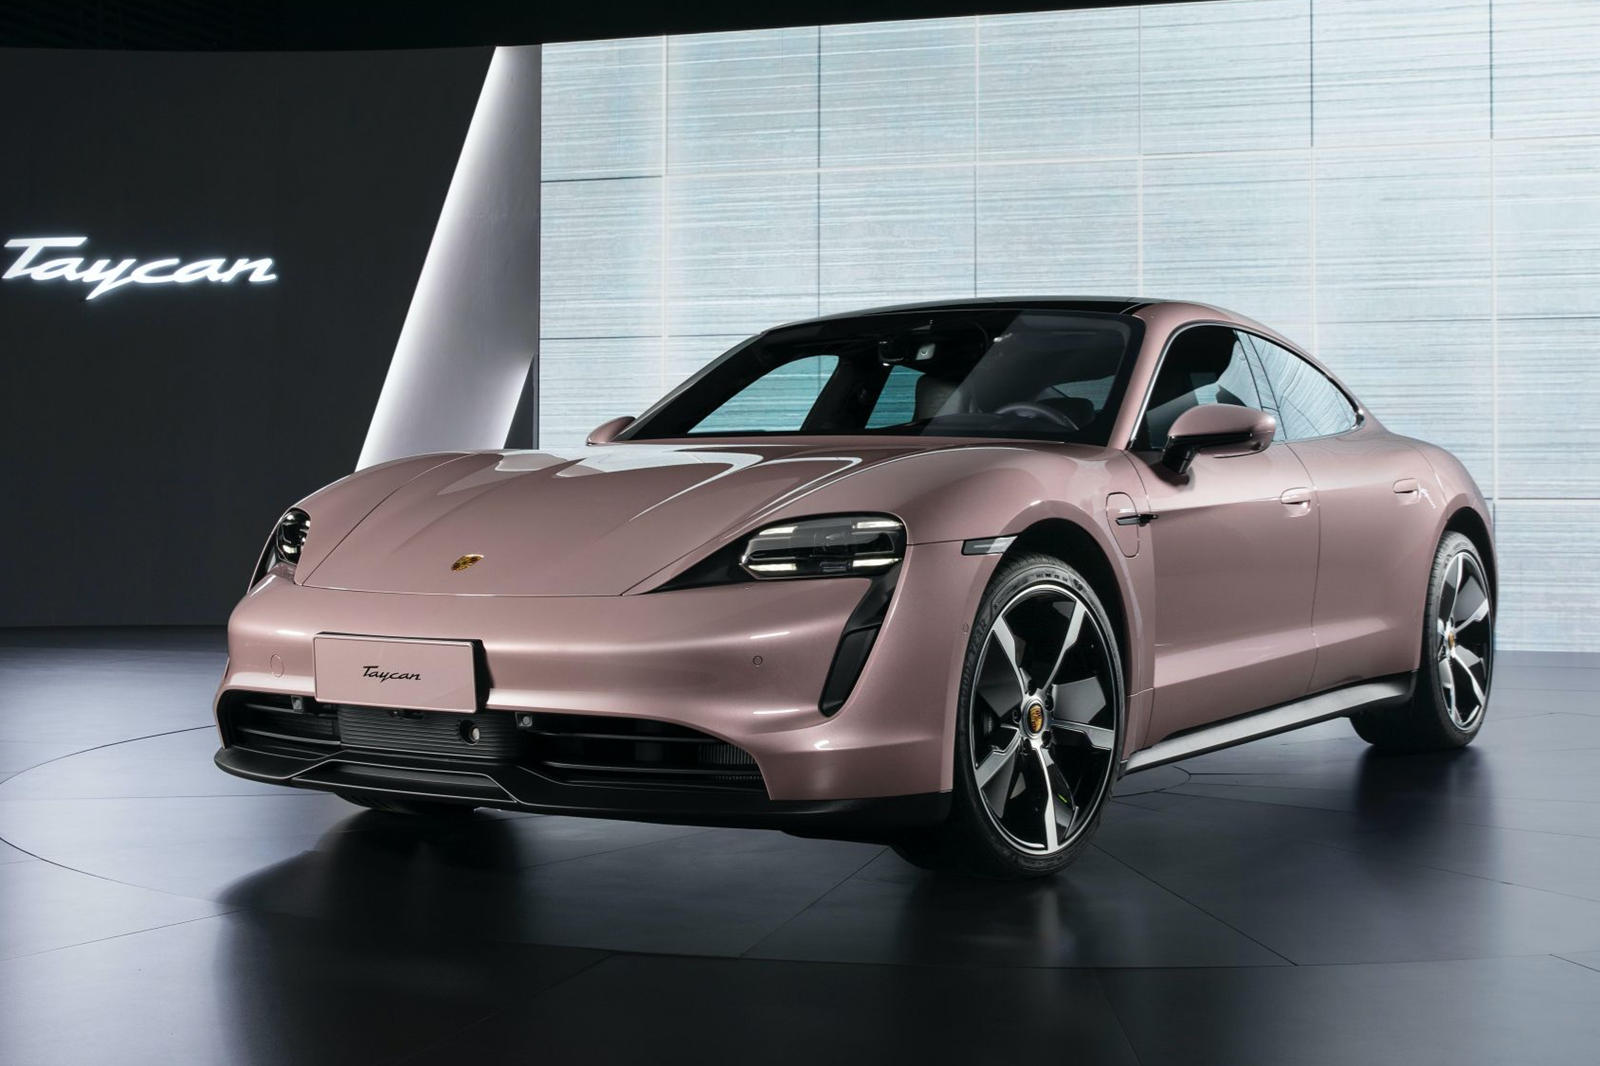 Porsche Pouring Millions Into Revolutionary Battery Tech